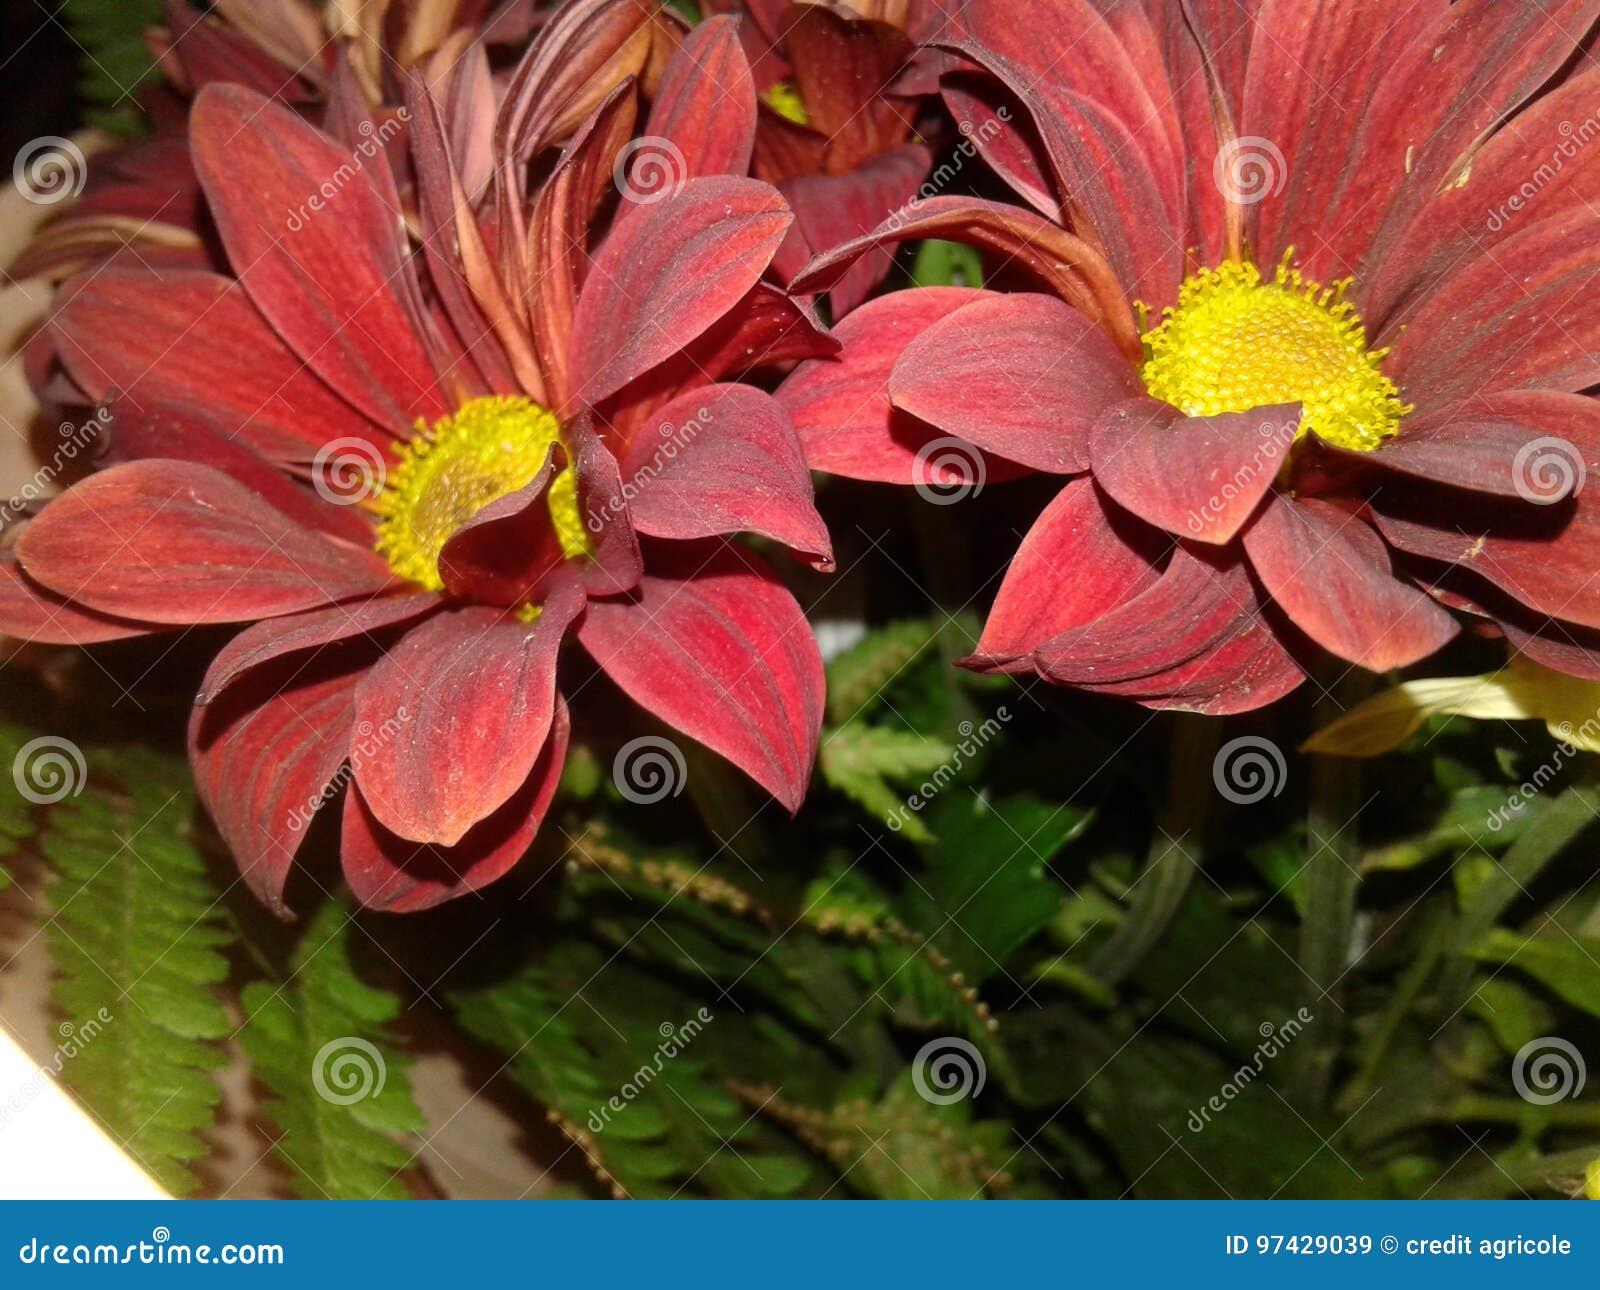 Flowers stock image image of plants bouquet light 97429039 royalty free stock photo izmirmasajfo Images